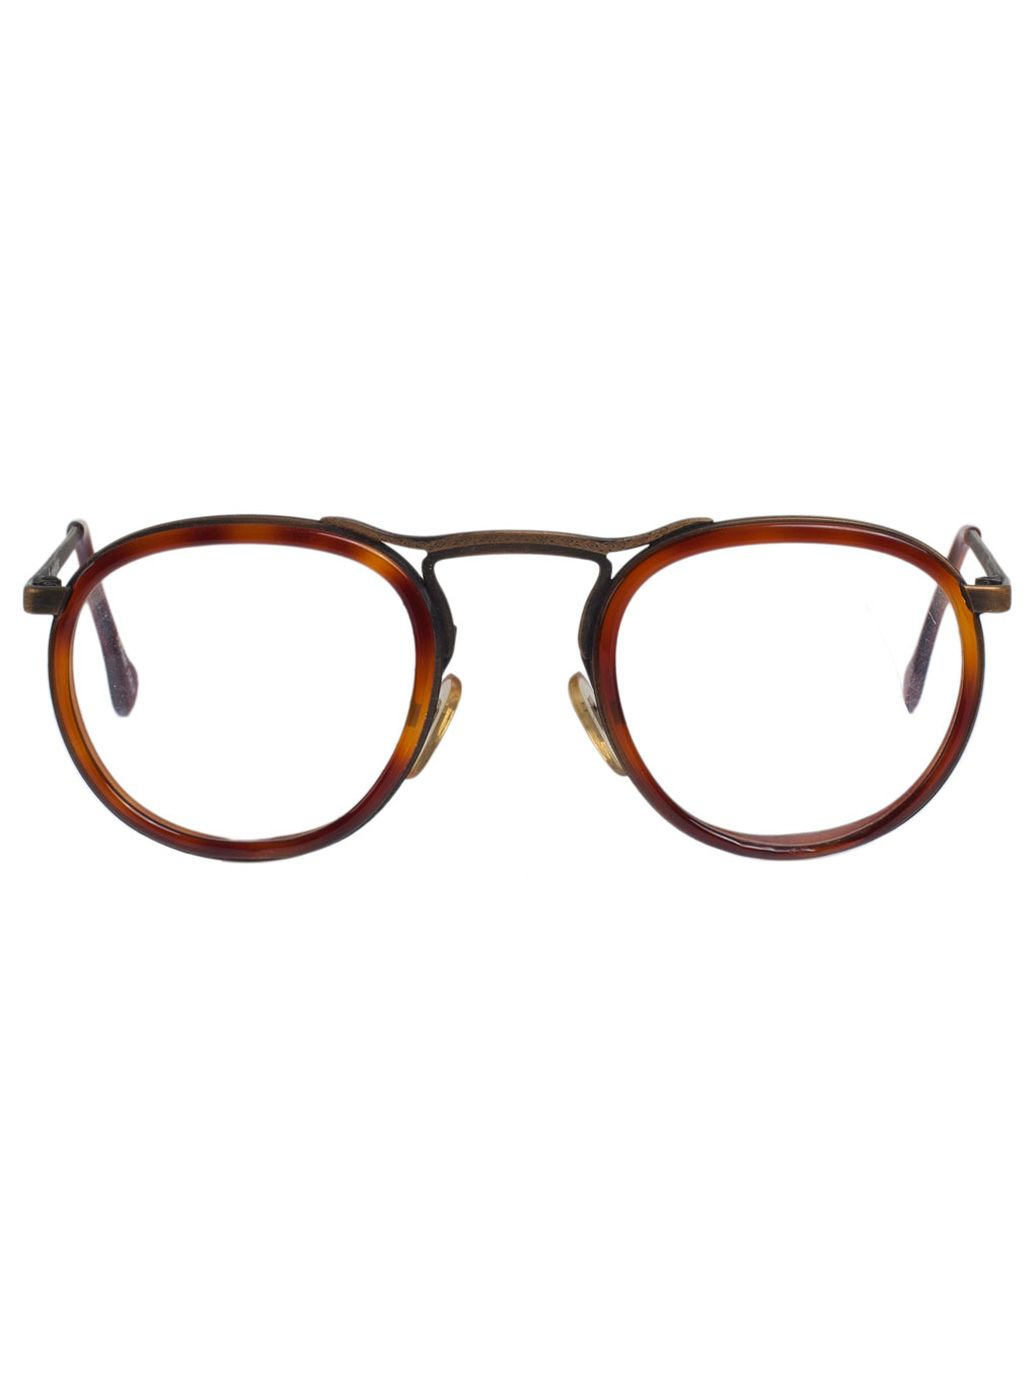 362d0e2cecd1c Vintage Le Club Optique Tortoise Shell Metal Eyeglasses Glasses Frames